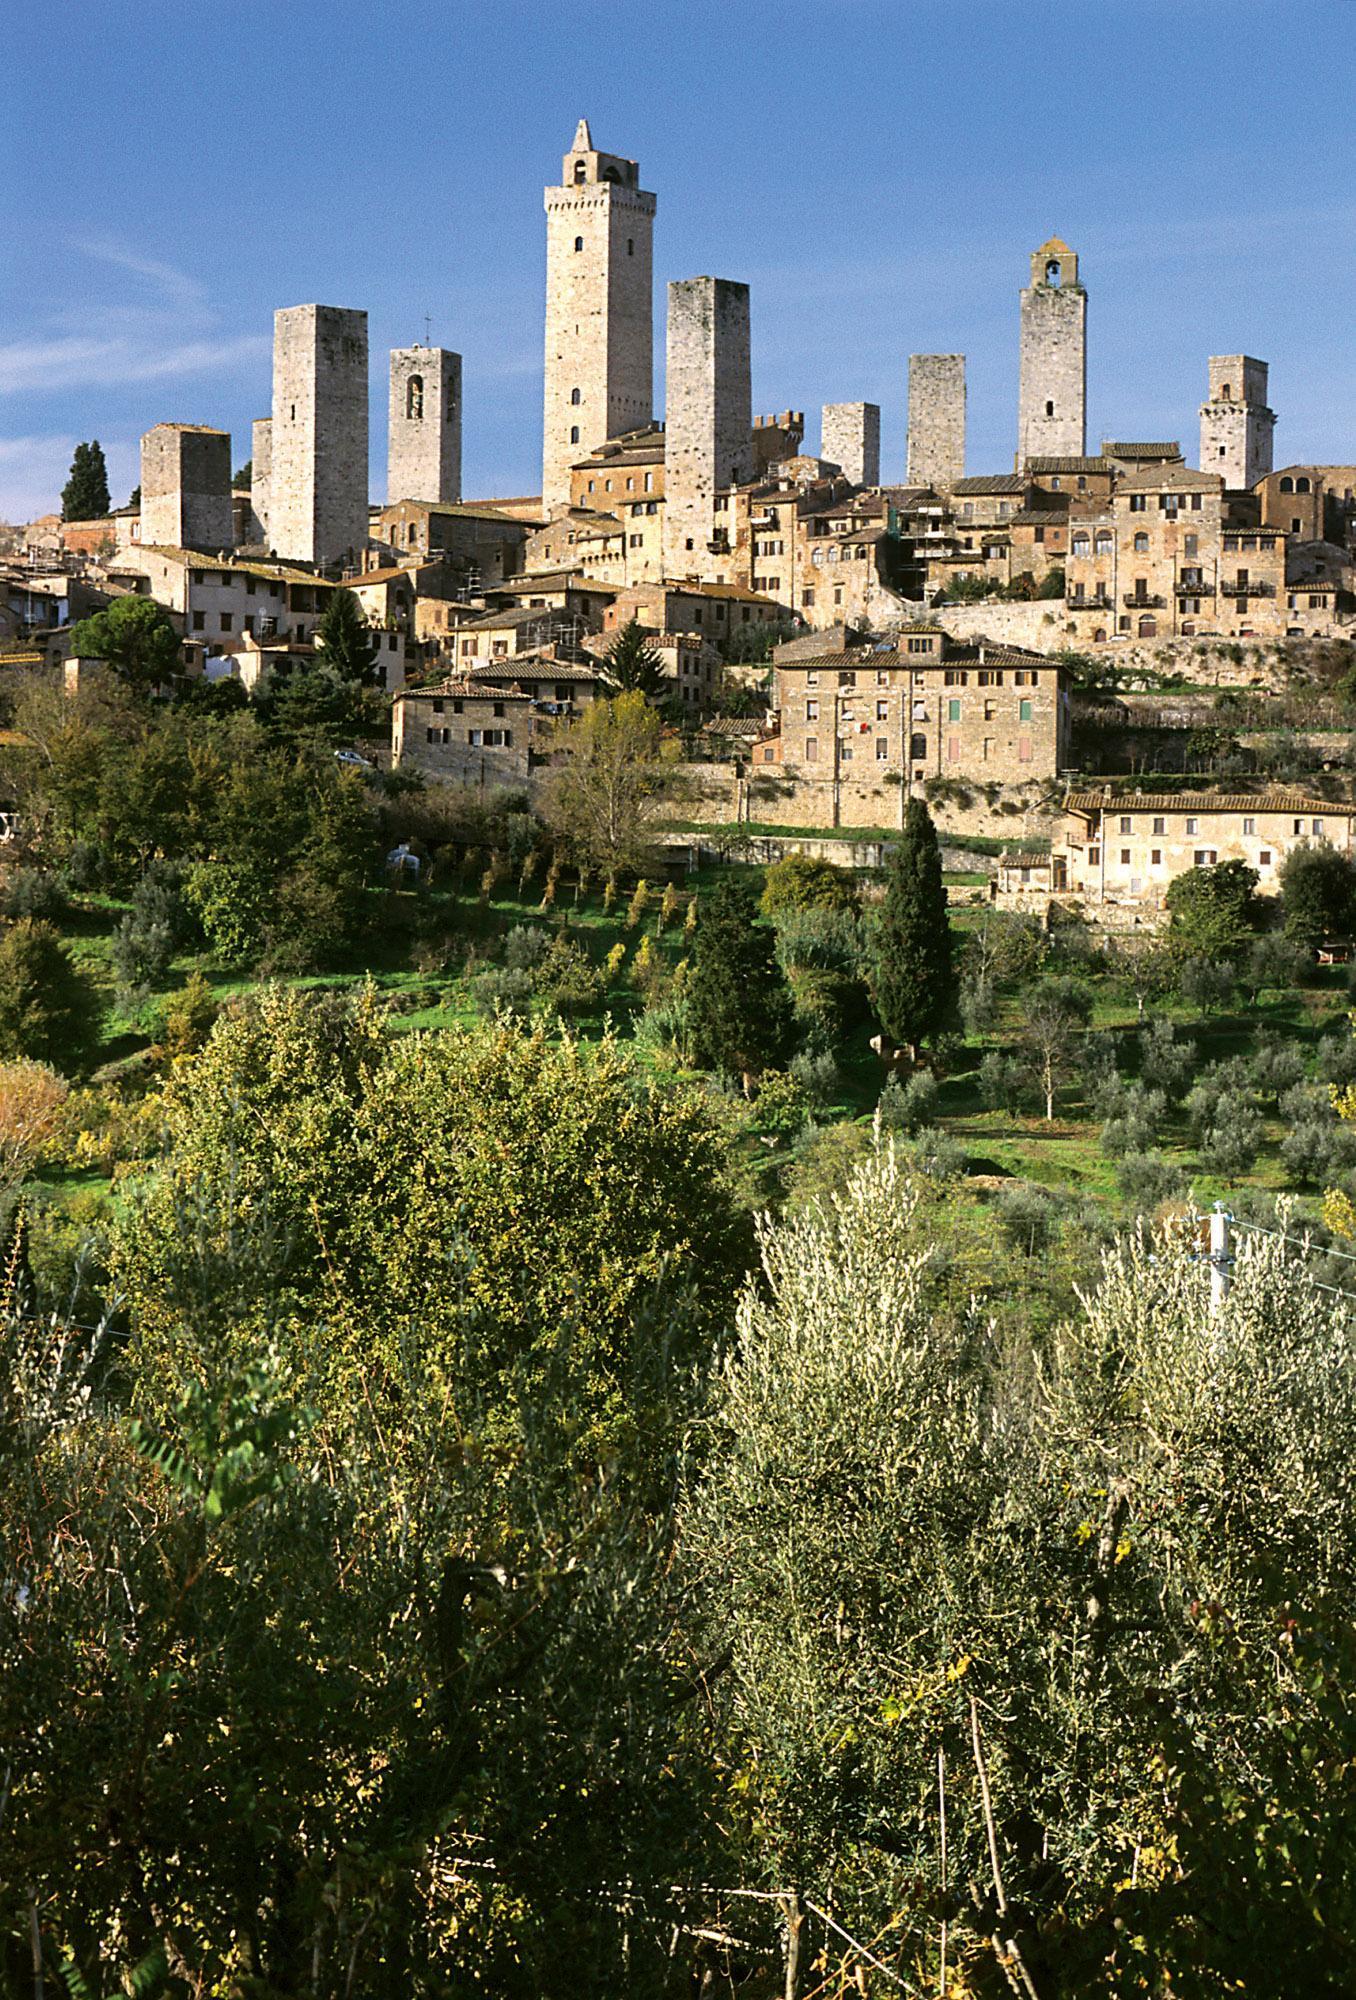 Une vue emblématique du centre historique de San Gimignano - © Comune di San Gimignano